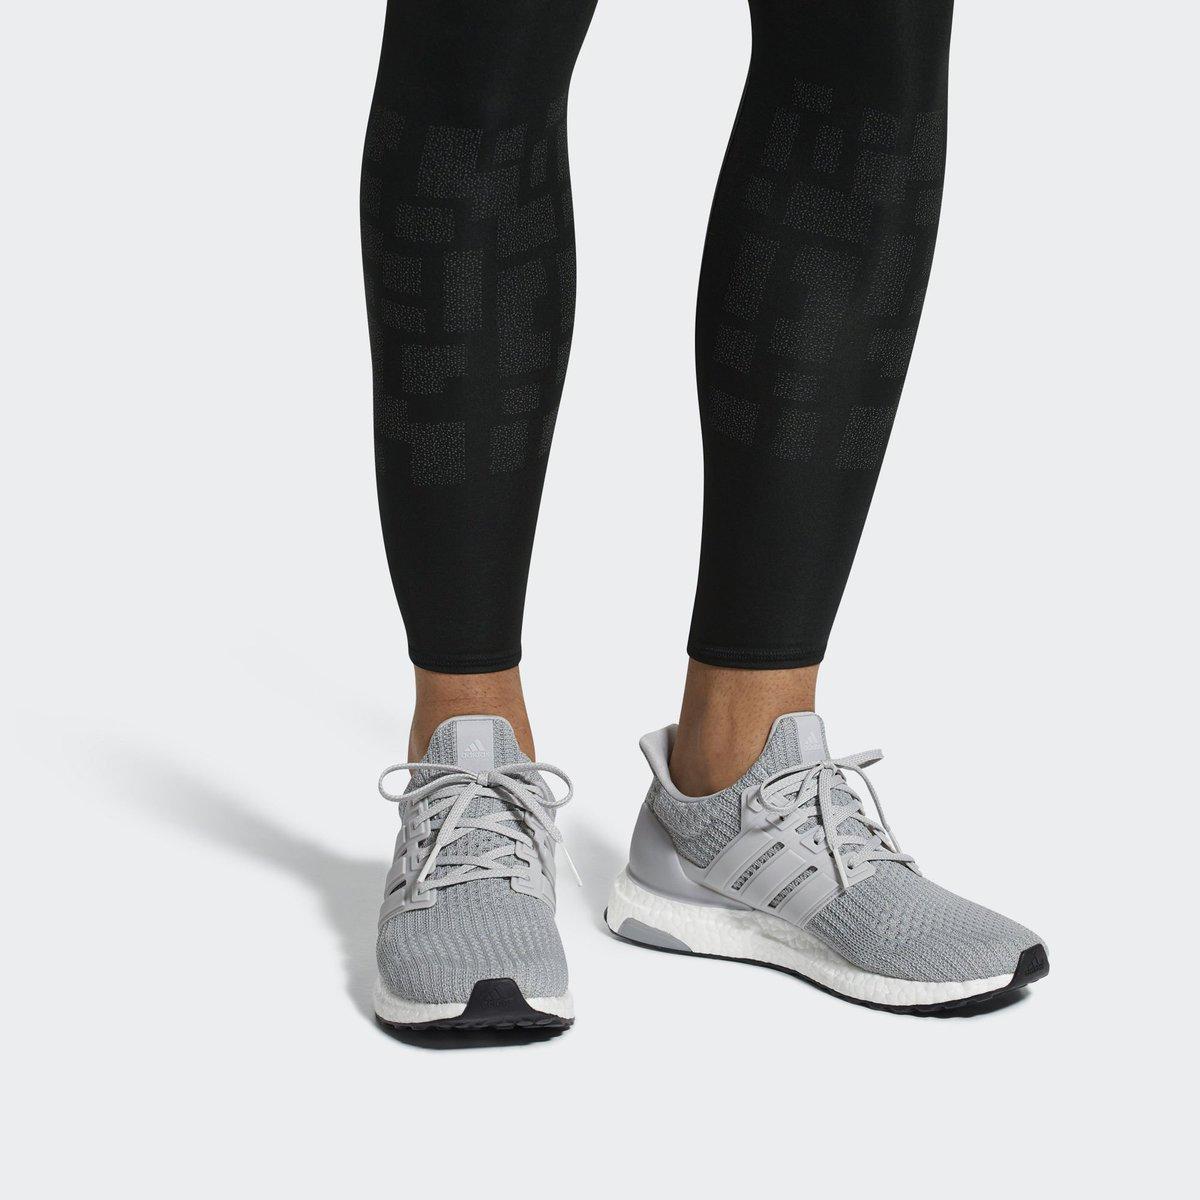 982a668453171 Restocked on  adidas US. adidas Ultra Boost 4.0 Grey Two. —   http   bit.ly 2ITgQfB pic.twitter.com 33VXhyrSDF